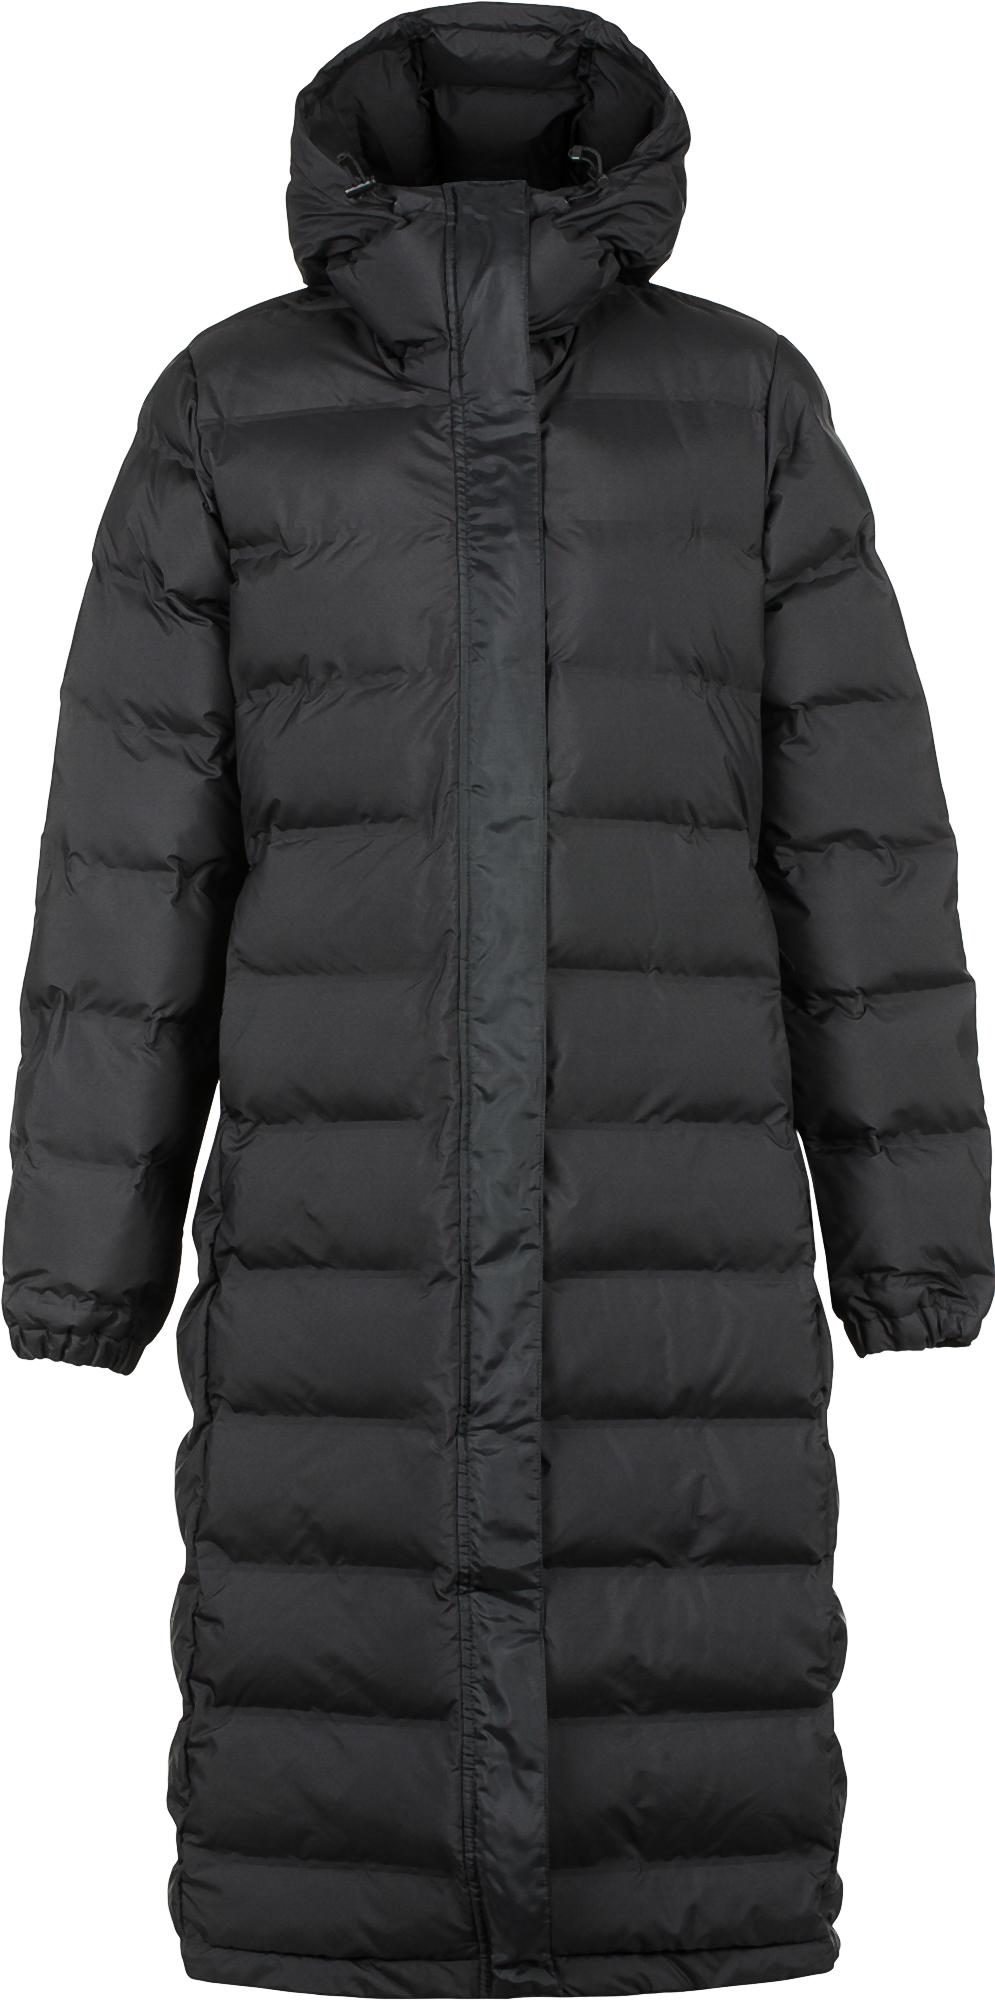 Adidas Куртка утепленная женская Helionic, размер 52-54